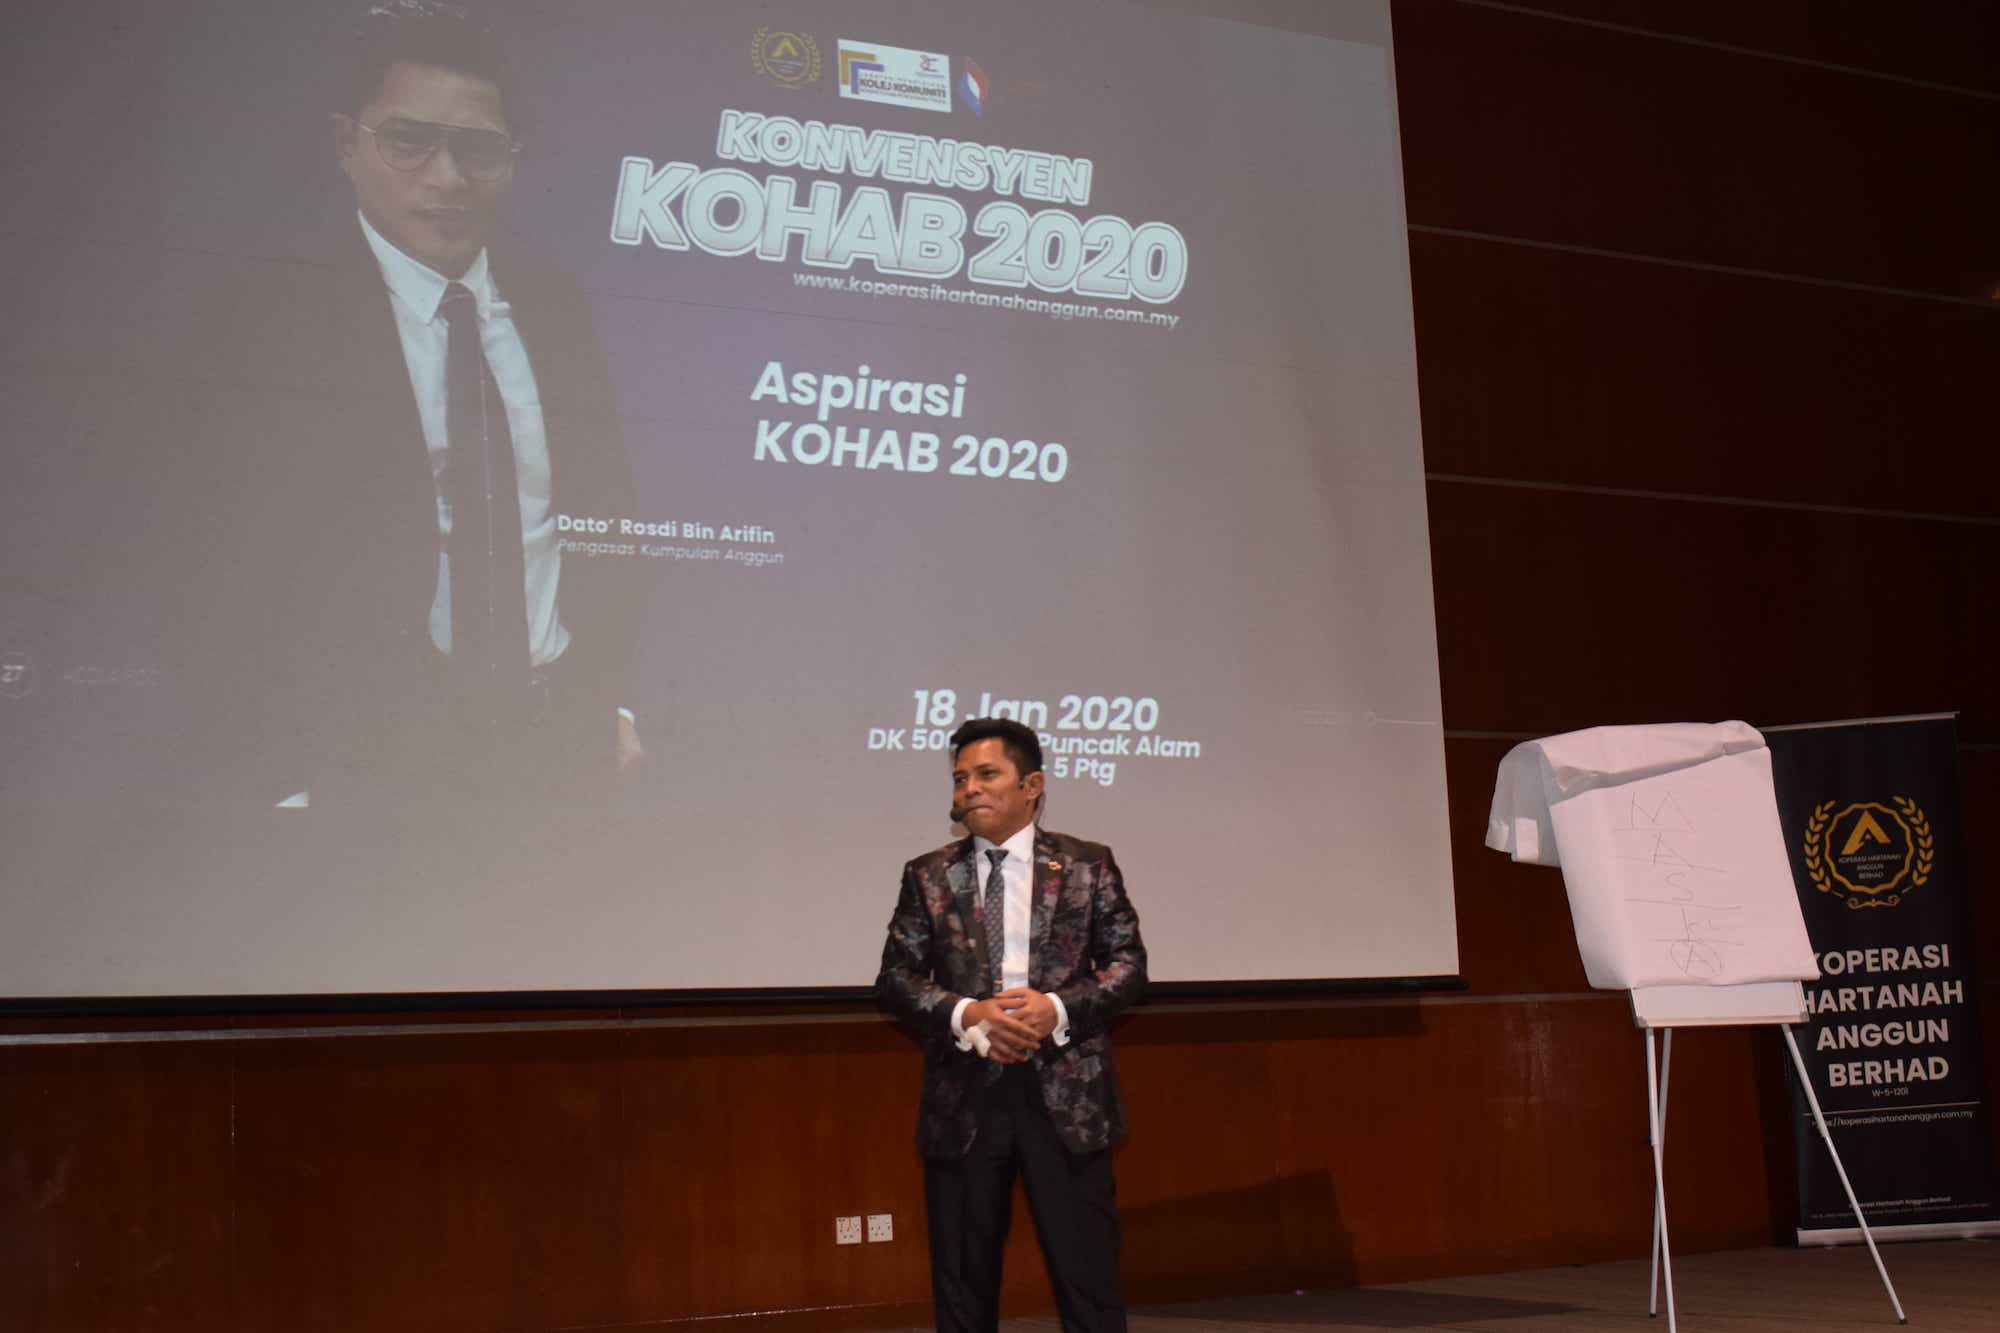 Konvensyen KOHAB 2020 9